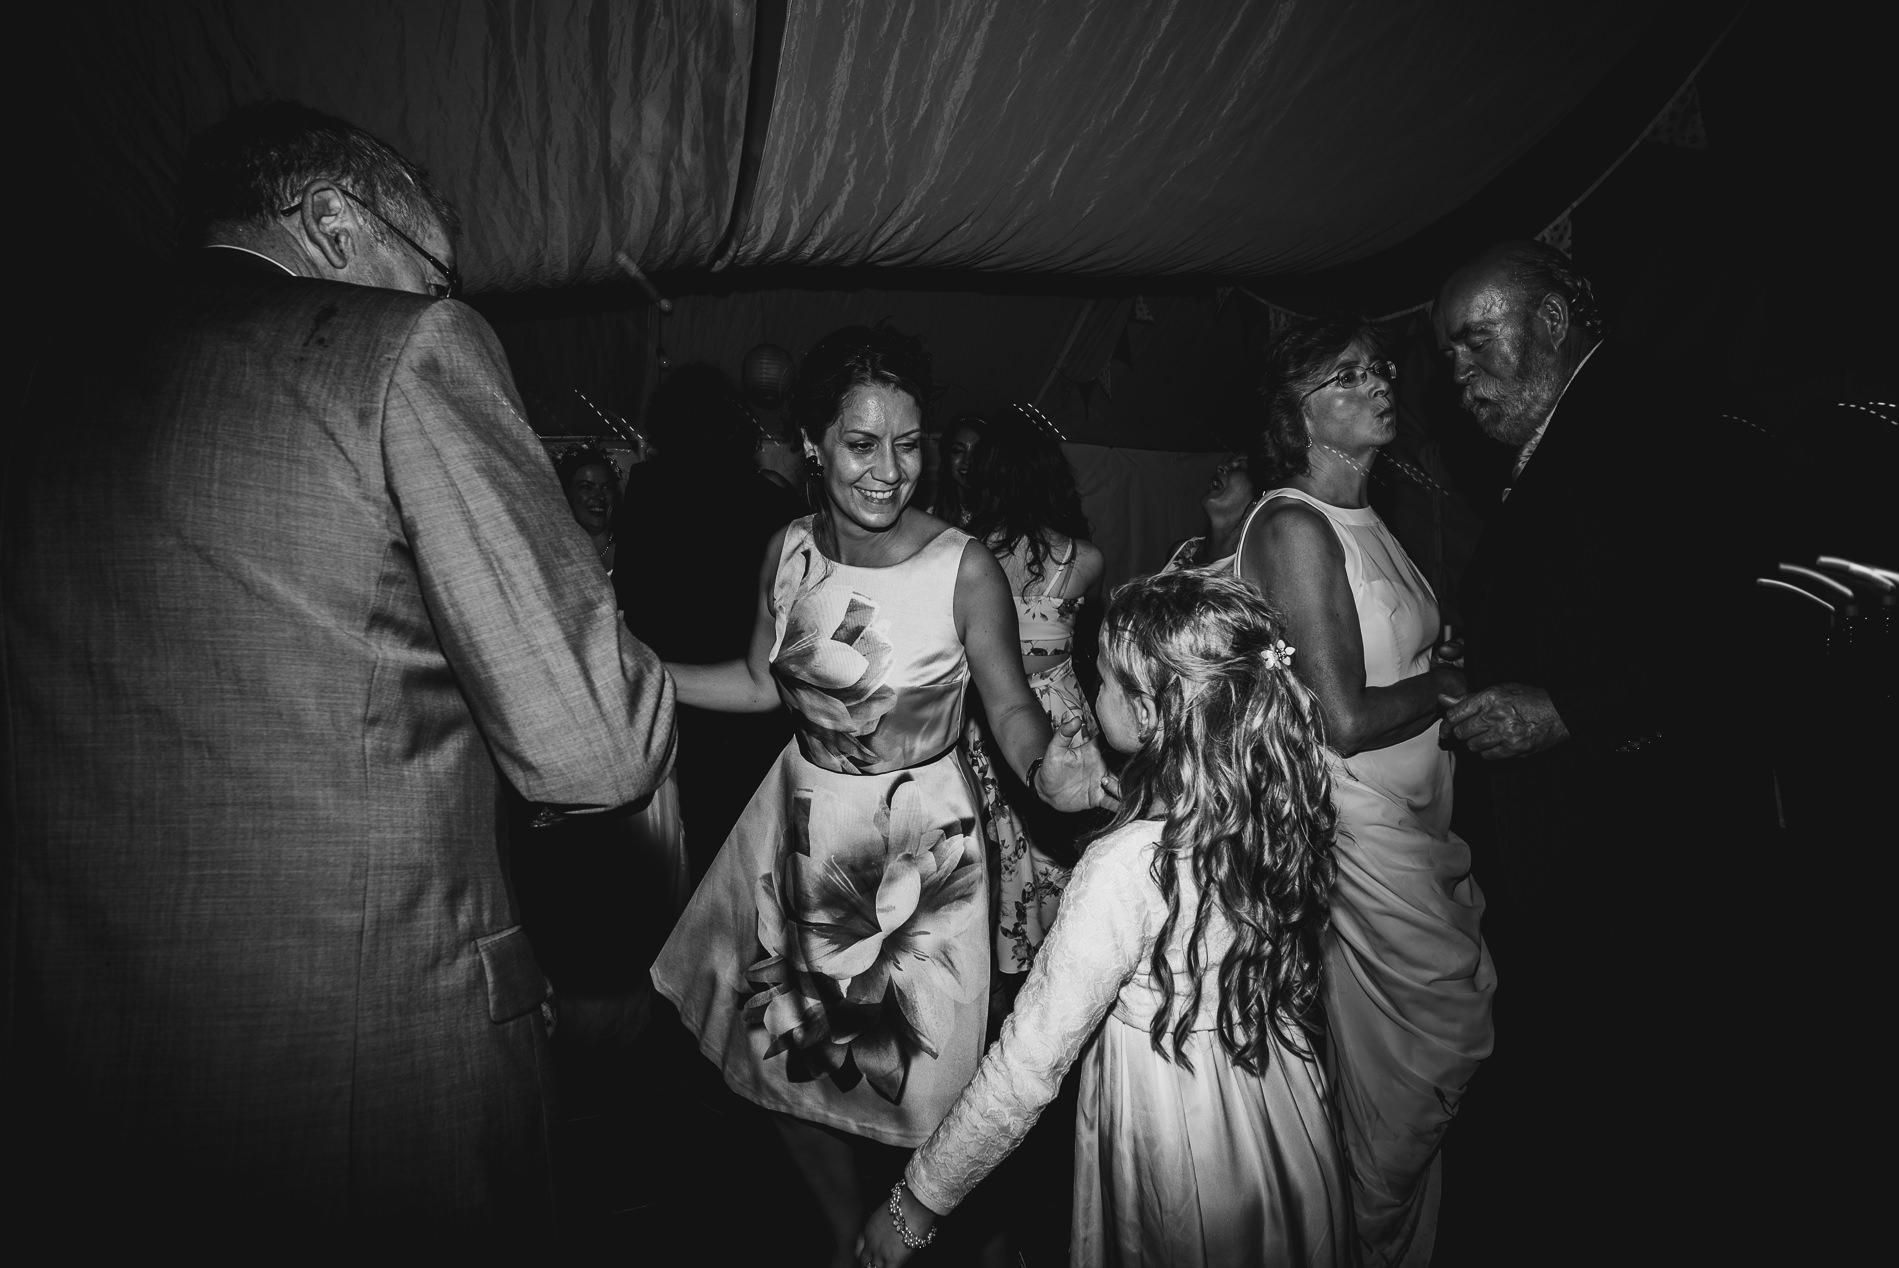 bohemian_wedding_lawshall_church_garden88